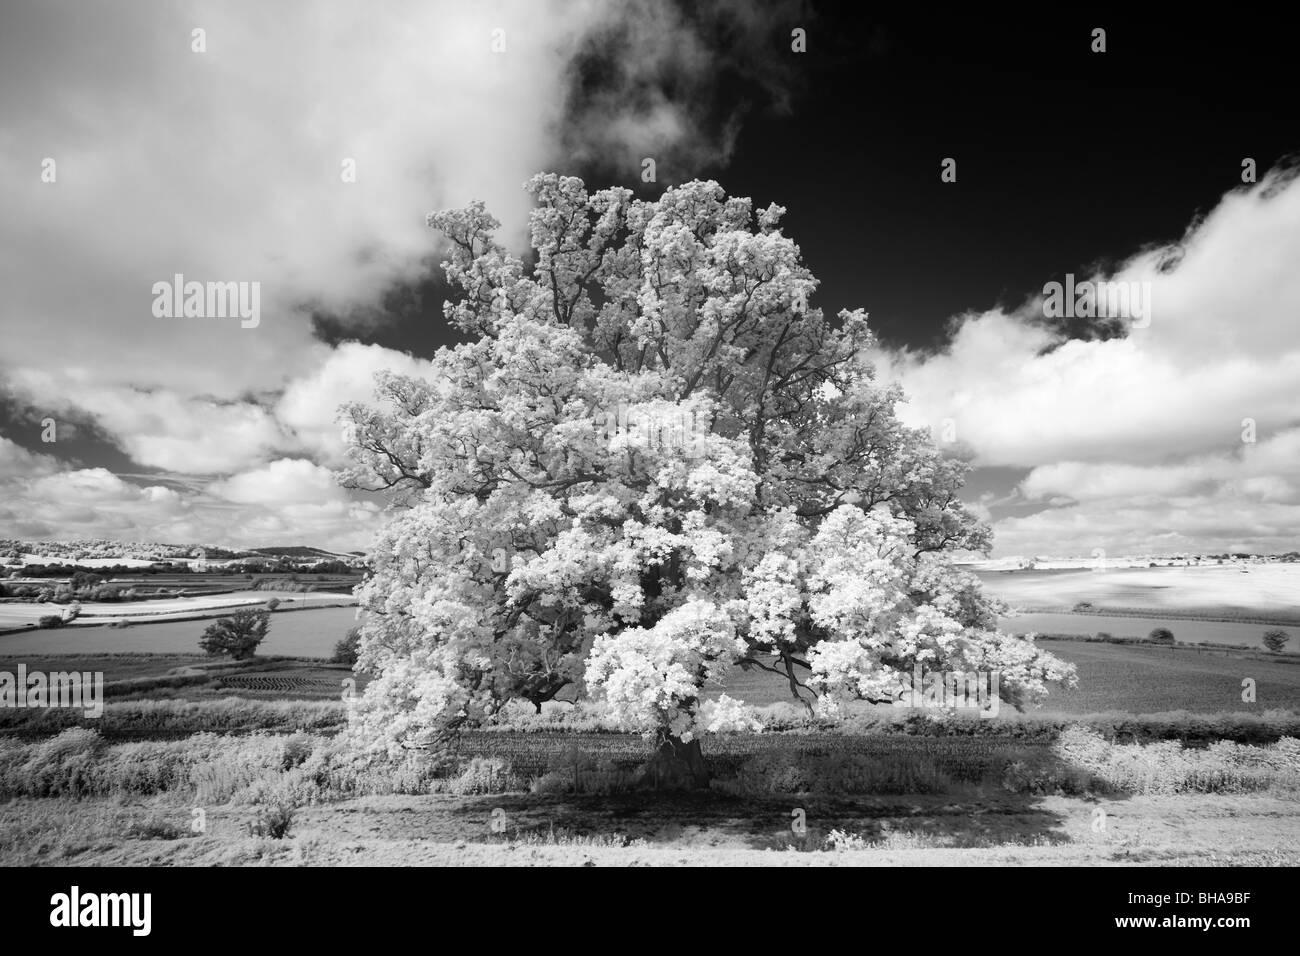 trees at Minterne Magna, Dorset, England, UK - Stock Image